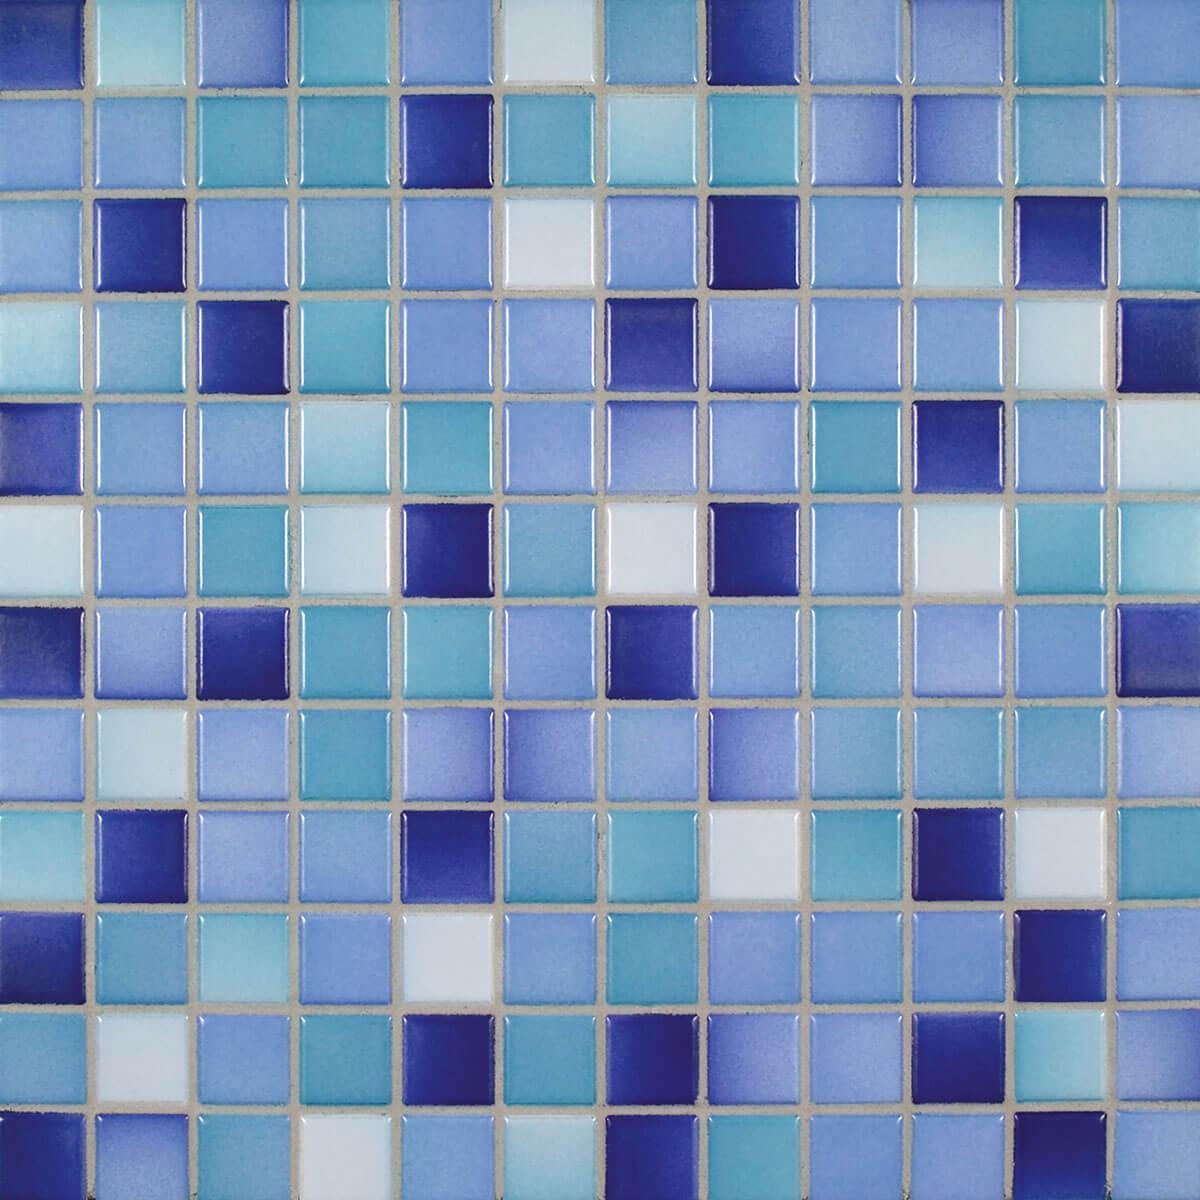 Agrob Buchtal Tiles - KLAY_Plural-_0005_BLUE25-–-5530I-7160H-SPHERE-COOL